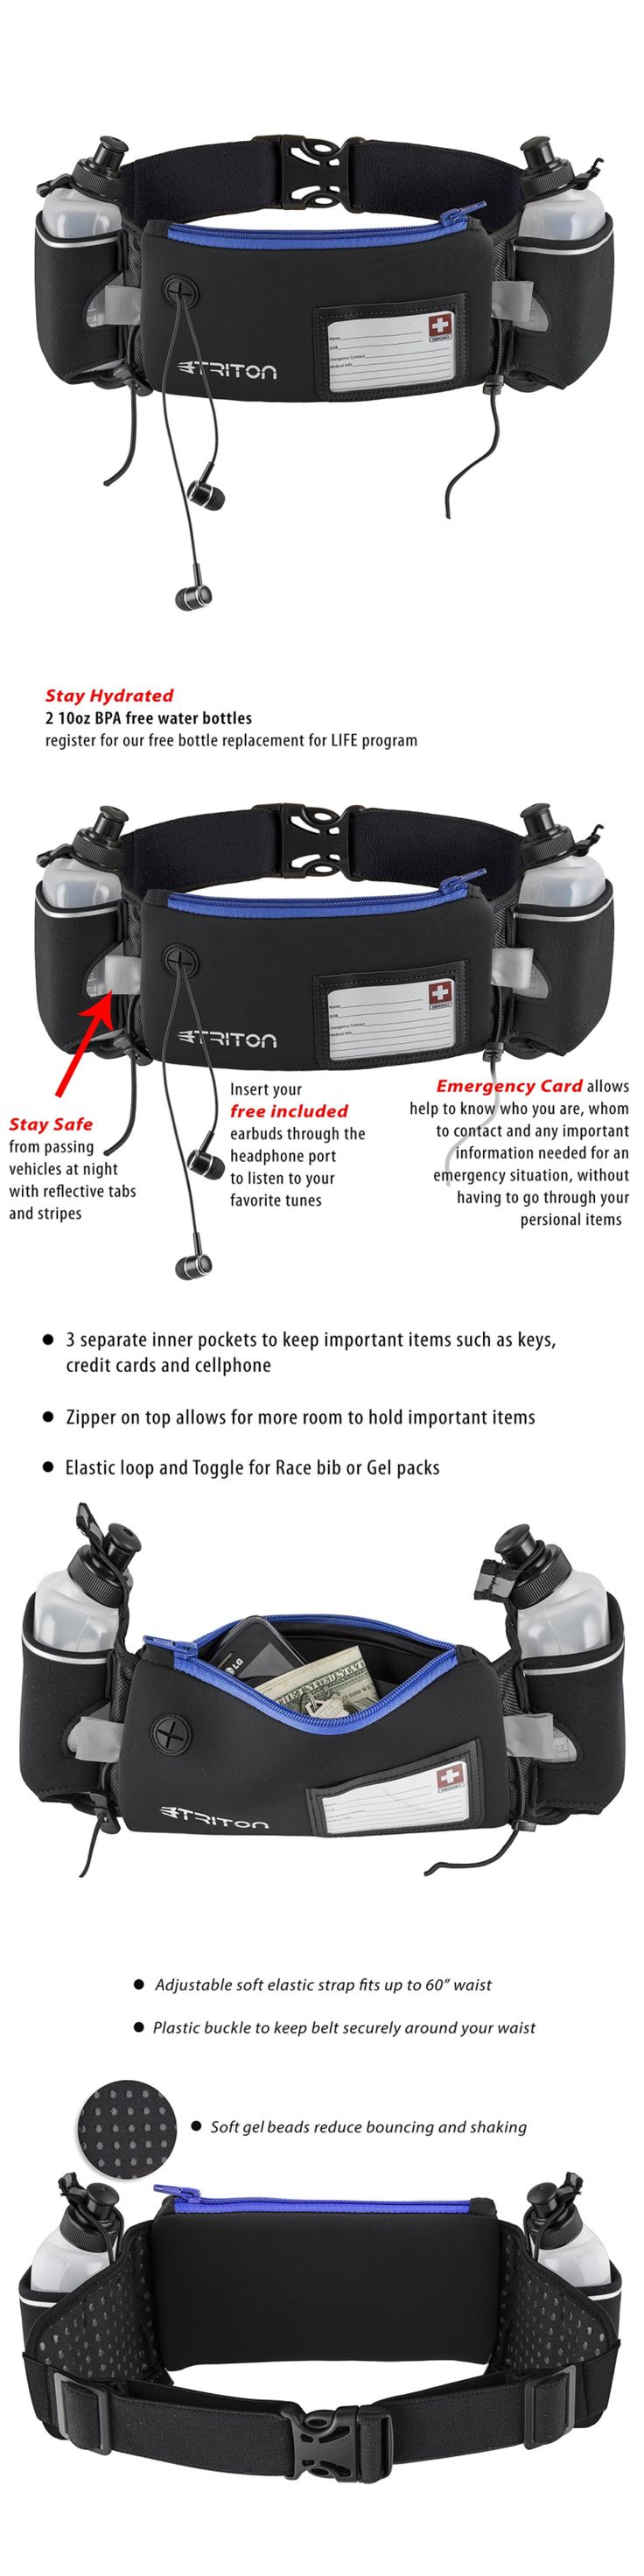 Running Belts 179802: Hydration Running Belt - Free Headphones - 2 Bpa Free Water Bottles - Emergency -> BUY IT NOW ONLY: $30.54 on eBay!